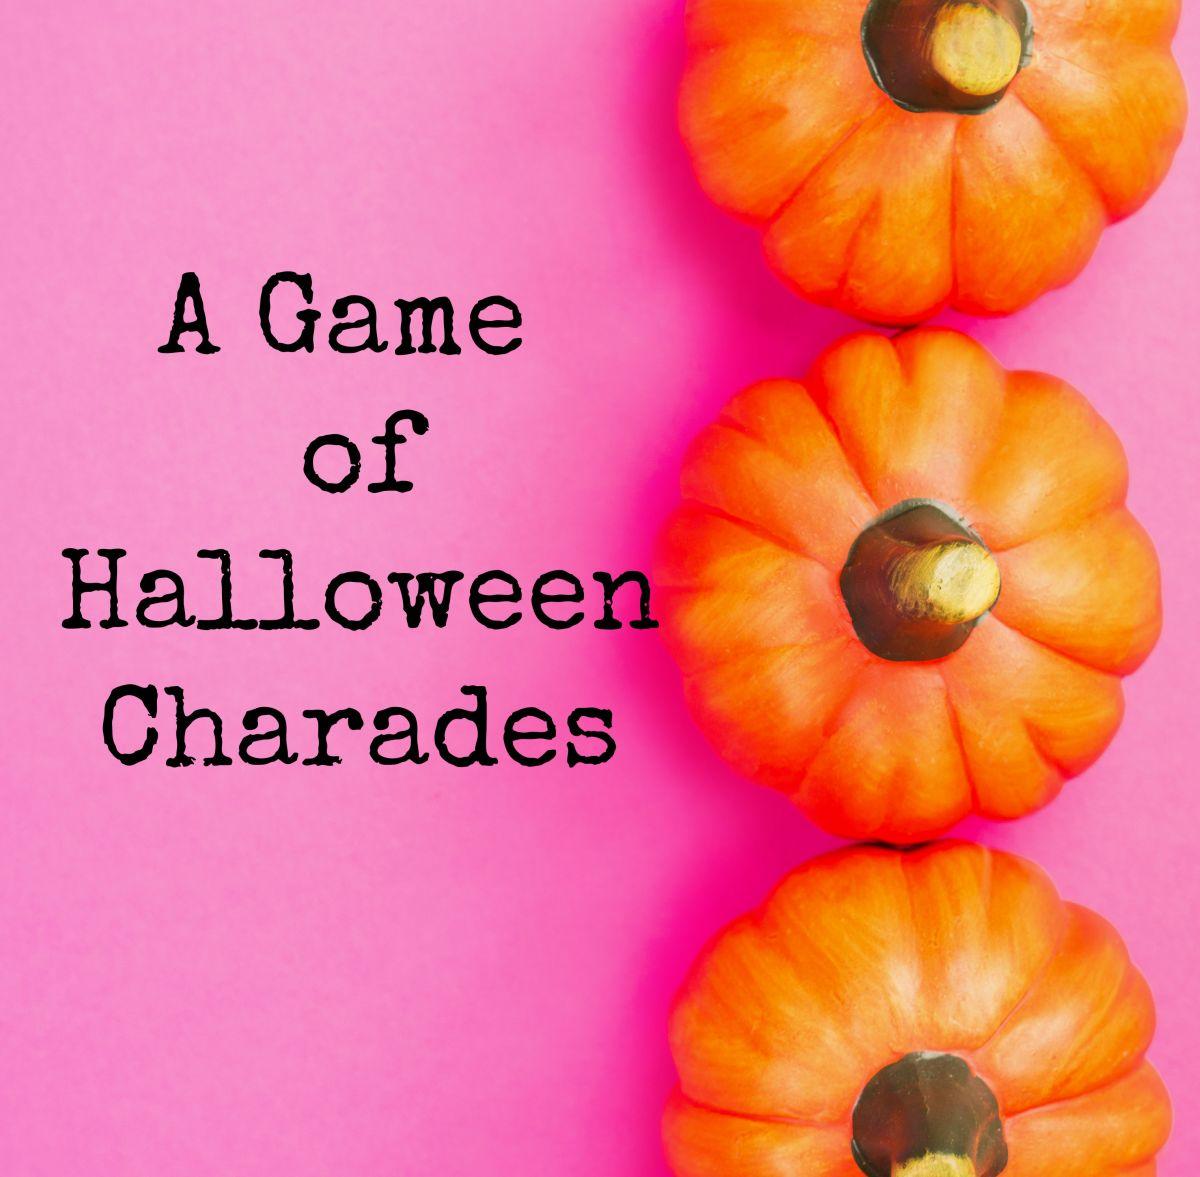 A Game of HalloweenCharades